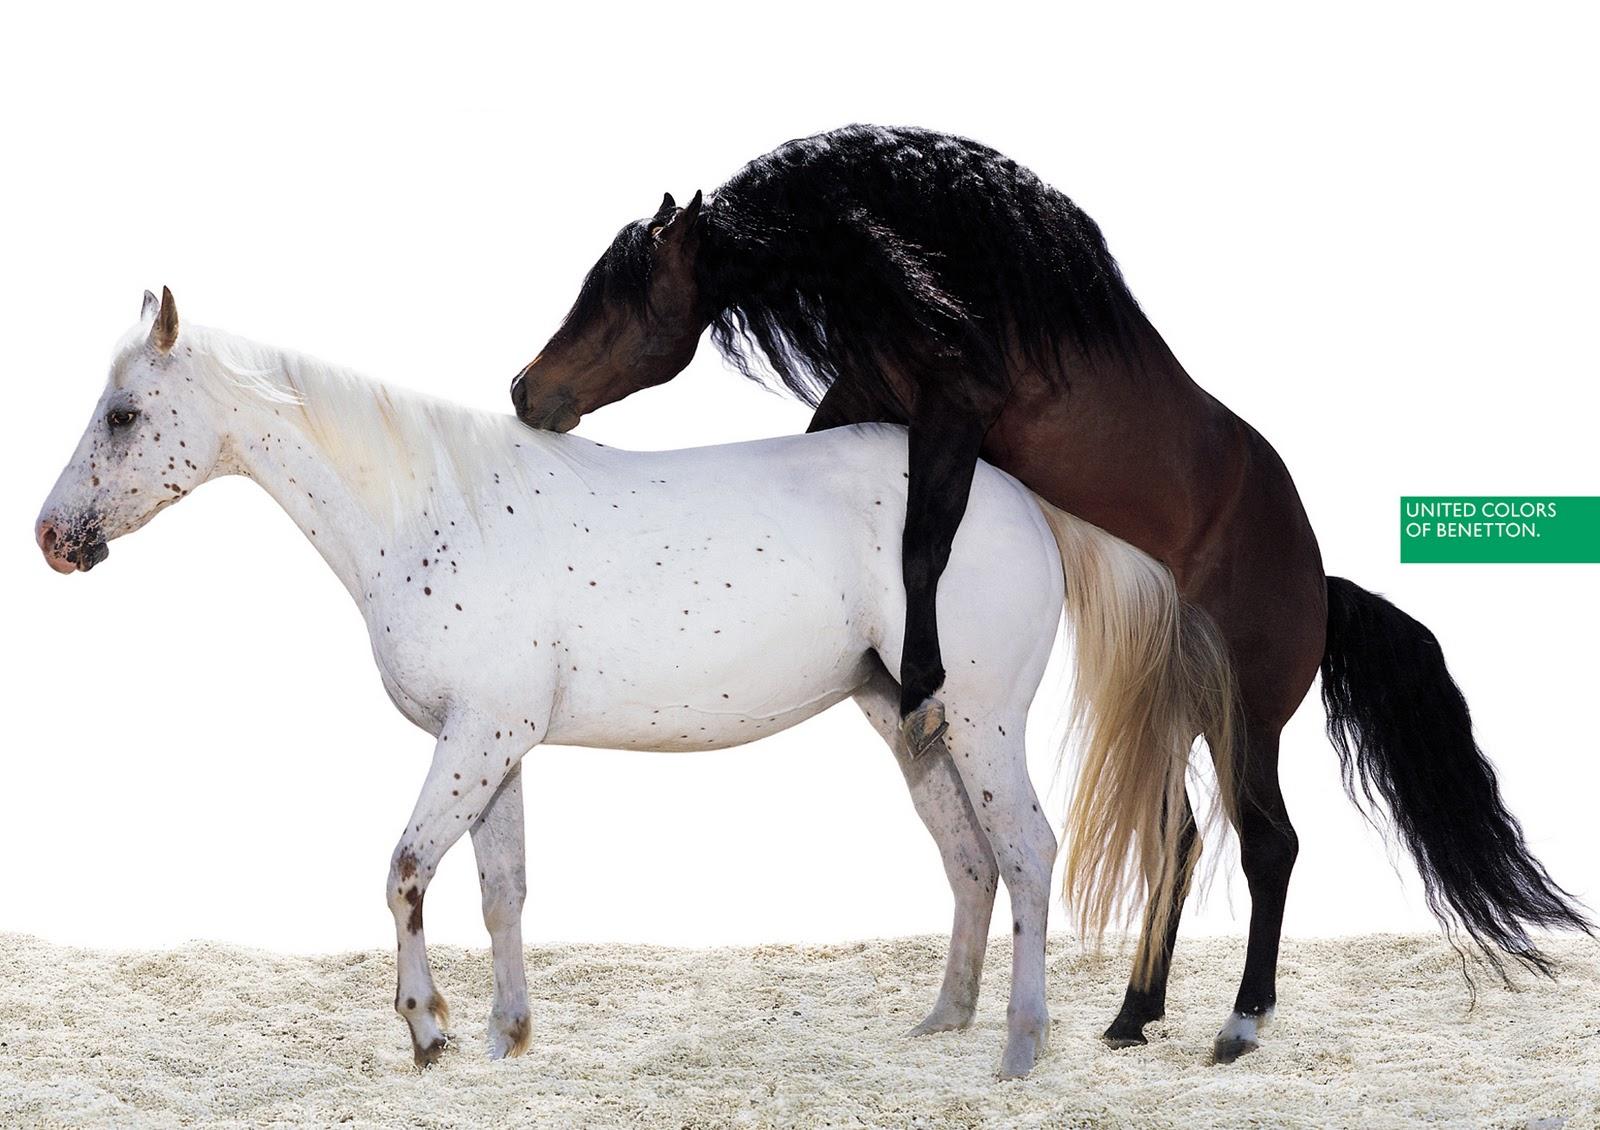 http://2.bp.blogspot.com/-9c5W_-sq7u0/TyLl2_jHDZI/AAAAAAAABl4/HGW_5d1Np3g/s1600/benetton-horse.jpg